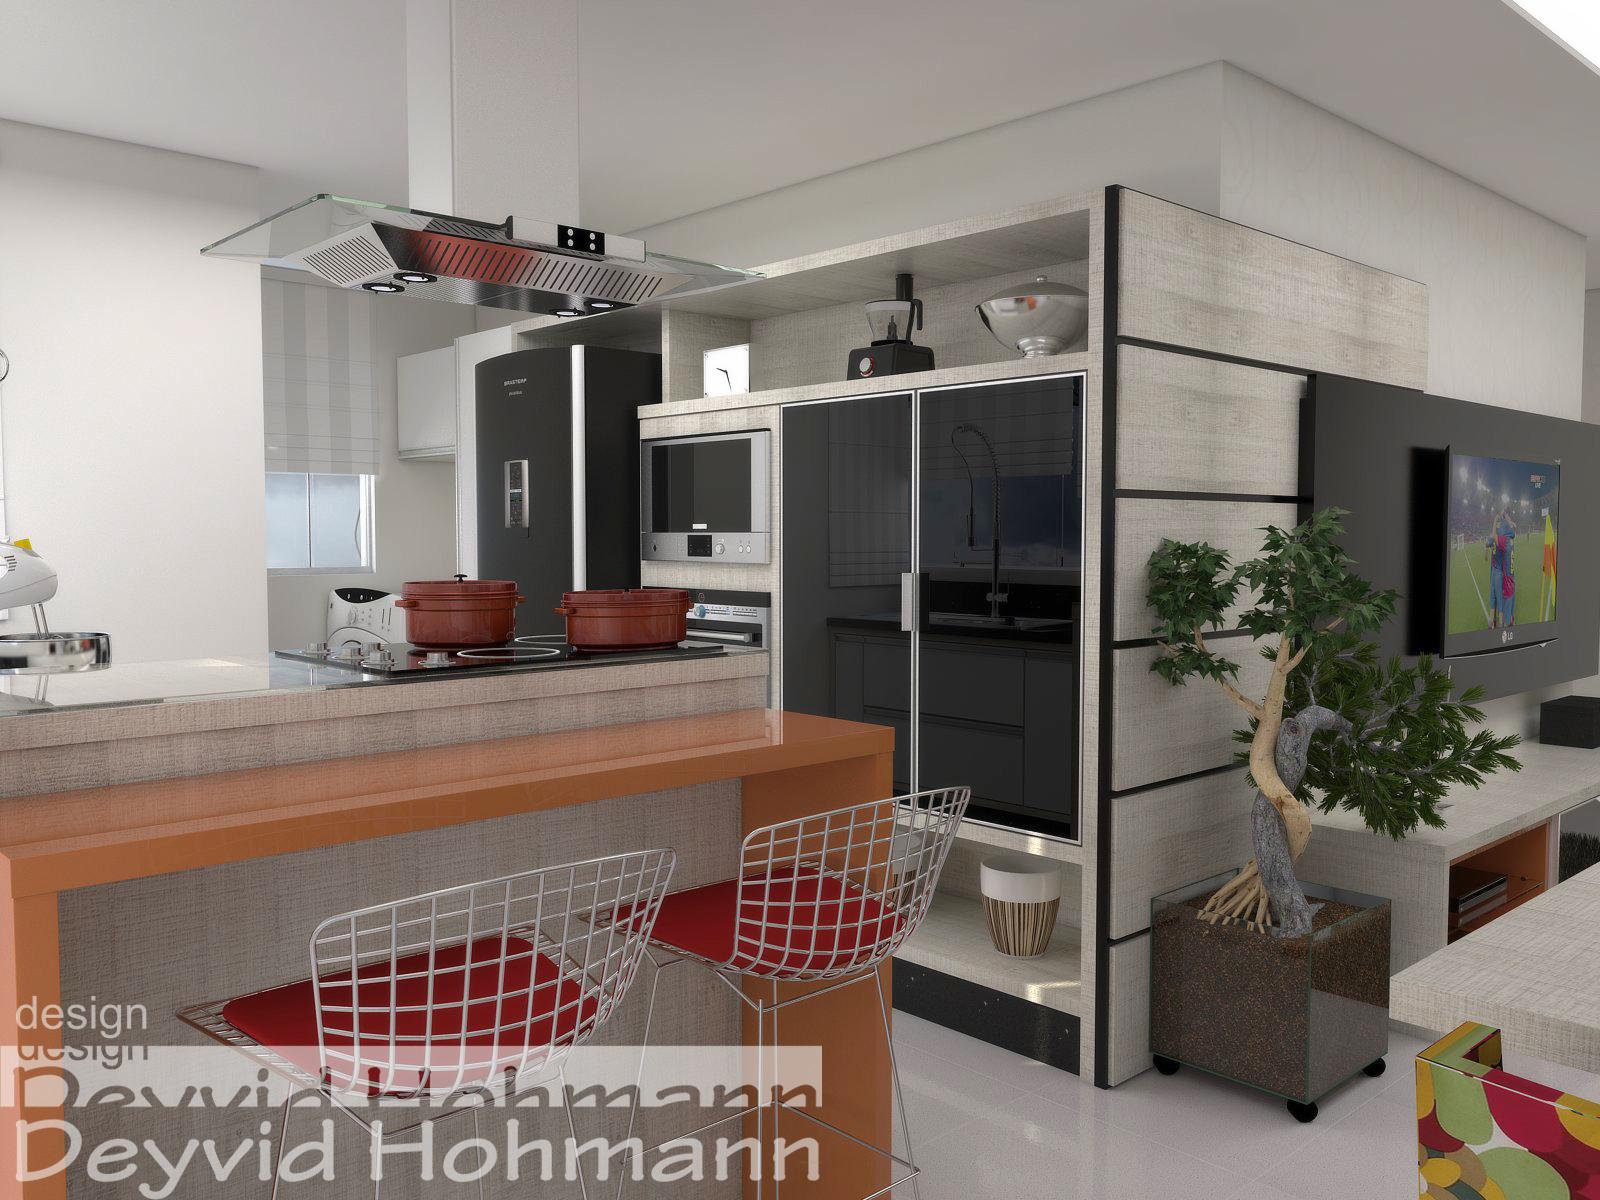 Deyvid Hohmann: Ambiente conjugado sala cozinha e lavanderia #6F3B2E 1600 1200